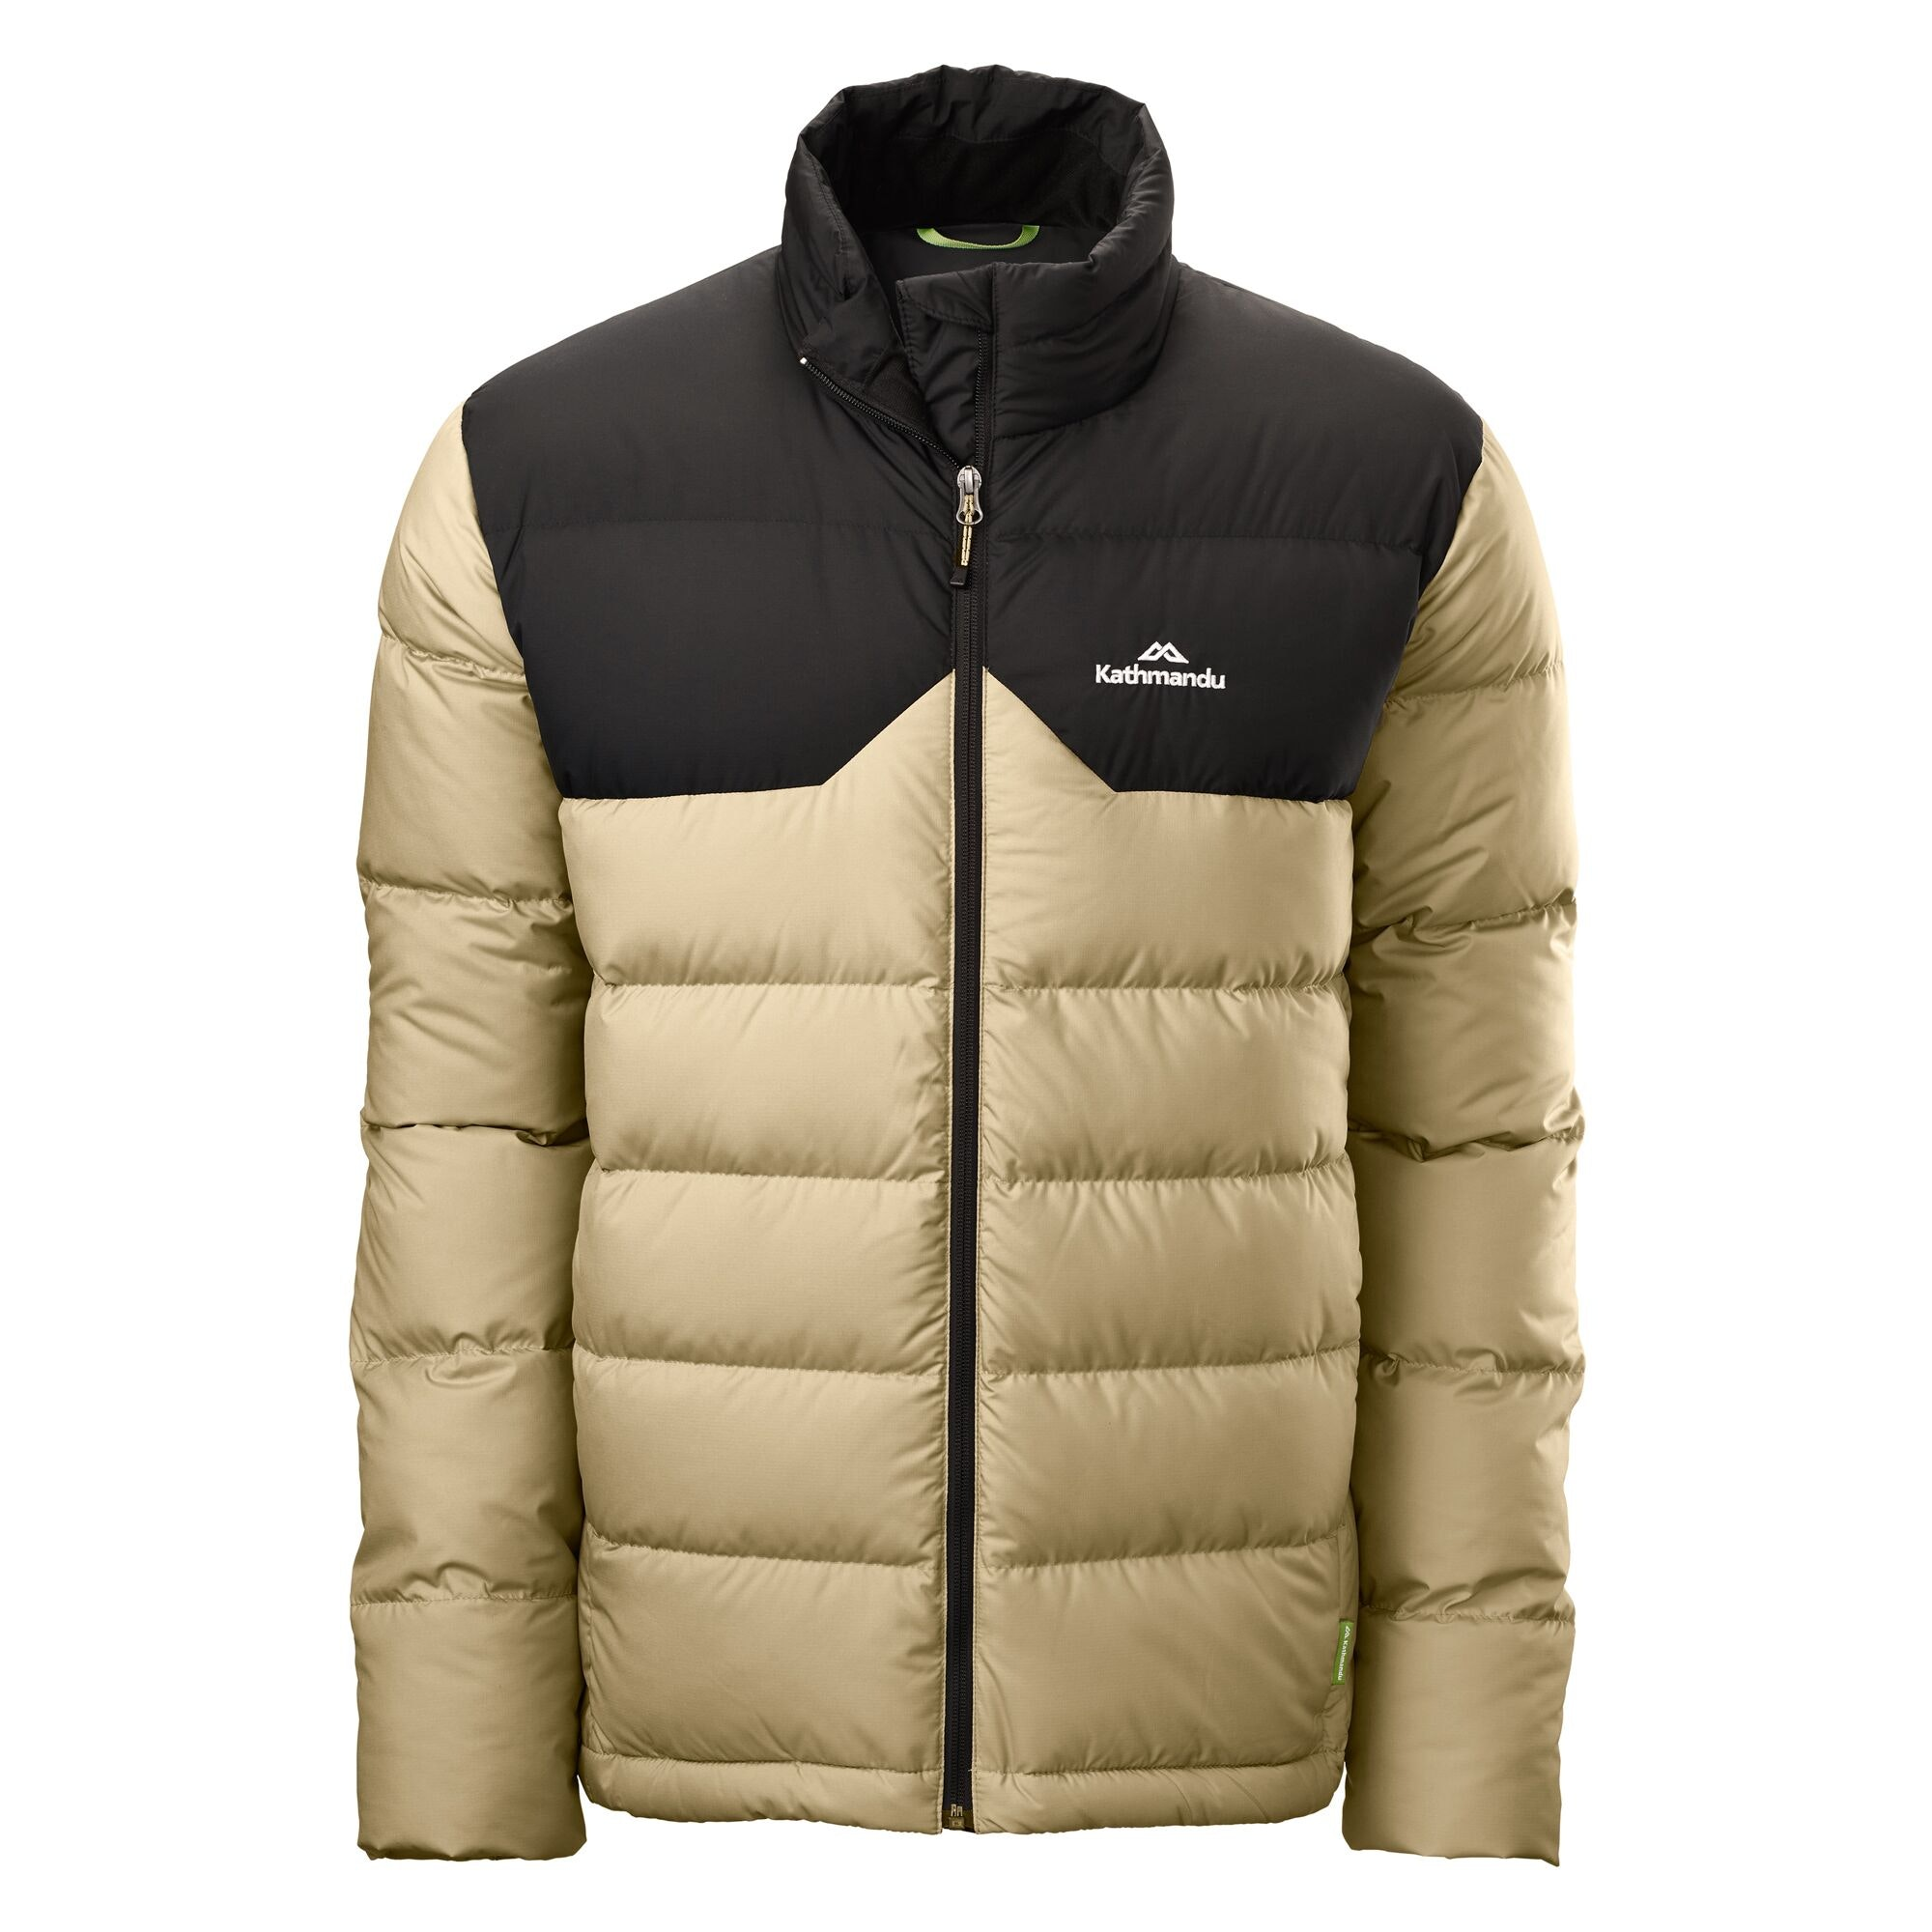 thumbnail 29 - NEW Kathmandu Epiq Mens 600 Fill Down Puffer Warm Outdoor Winter Jacket